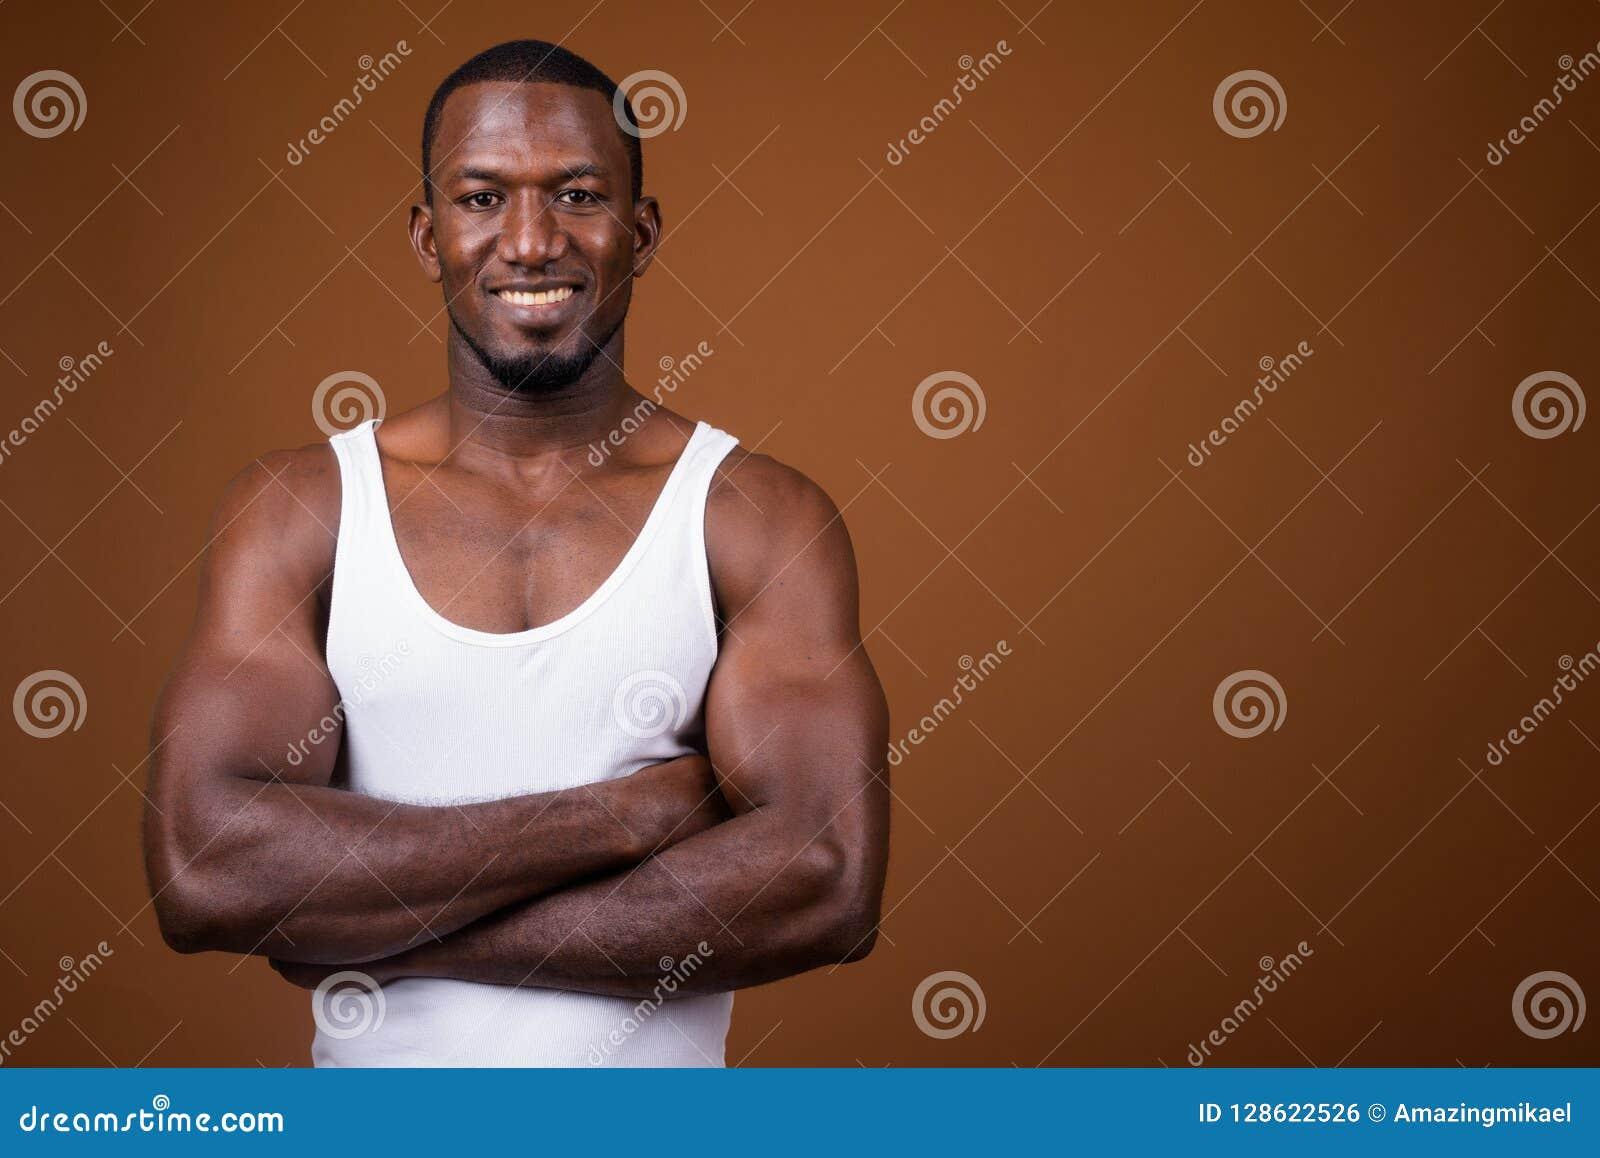 3625fffae Studio shot of handsome muscular African man wearing tank top against brown  background